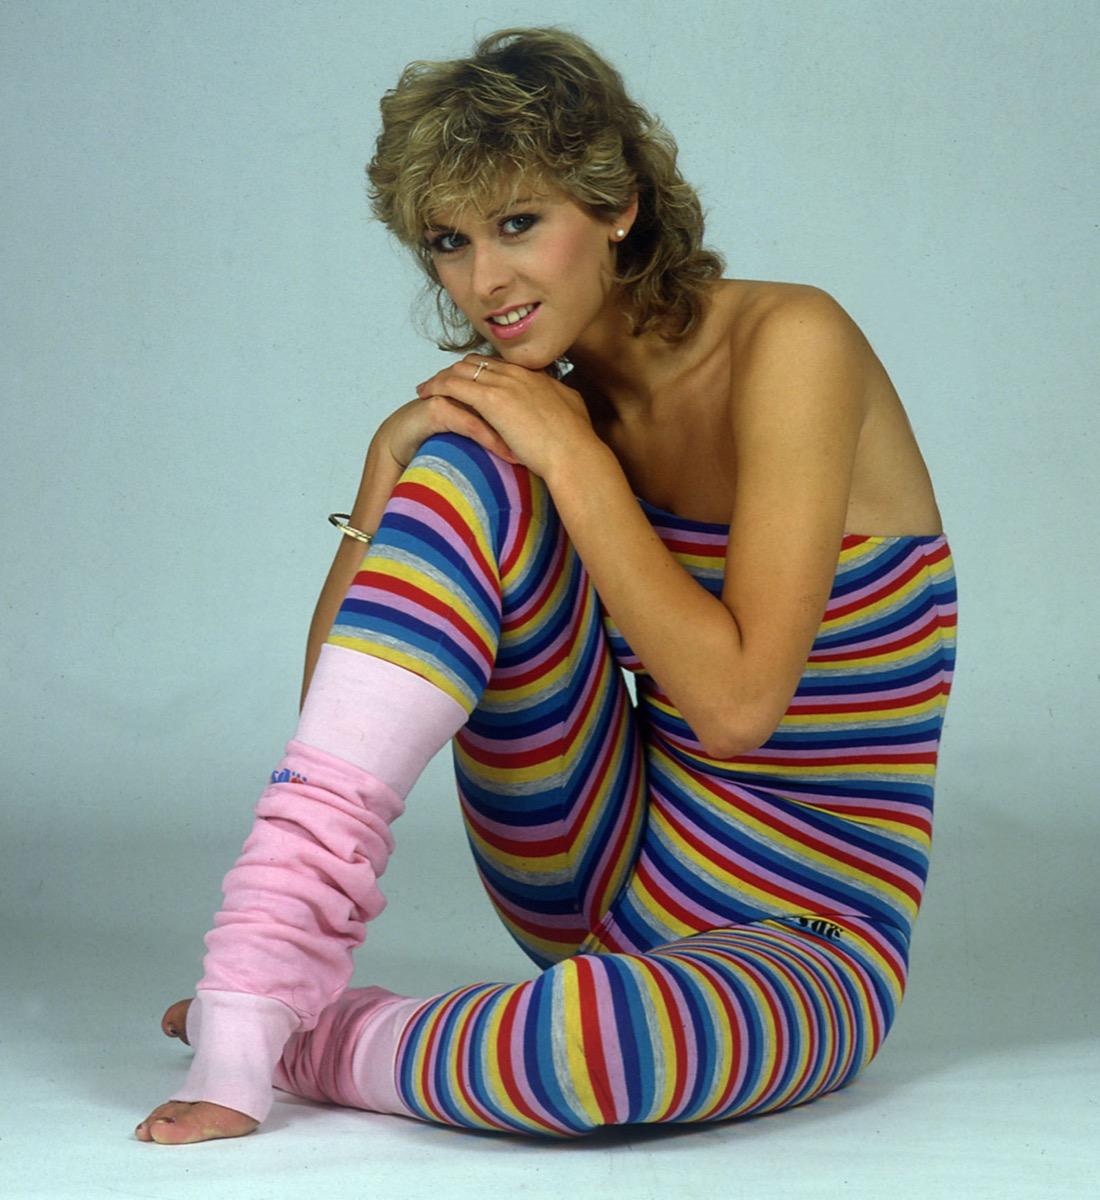 Sharron Davies swimmer modelling clothes 1980s Leg Warmers